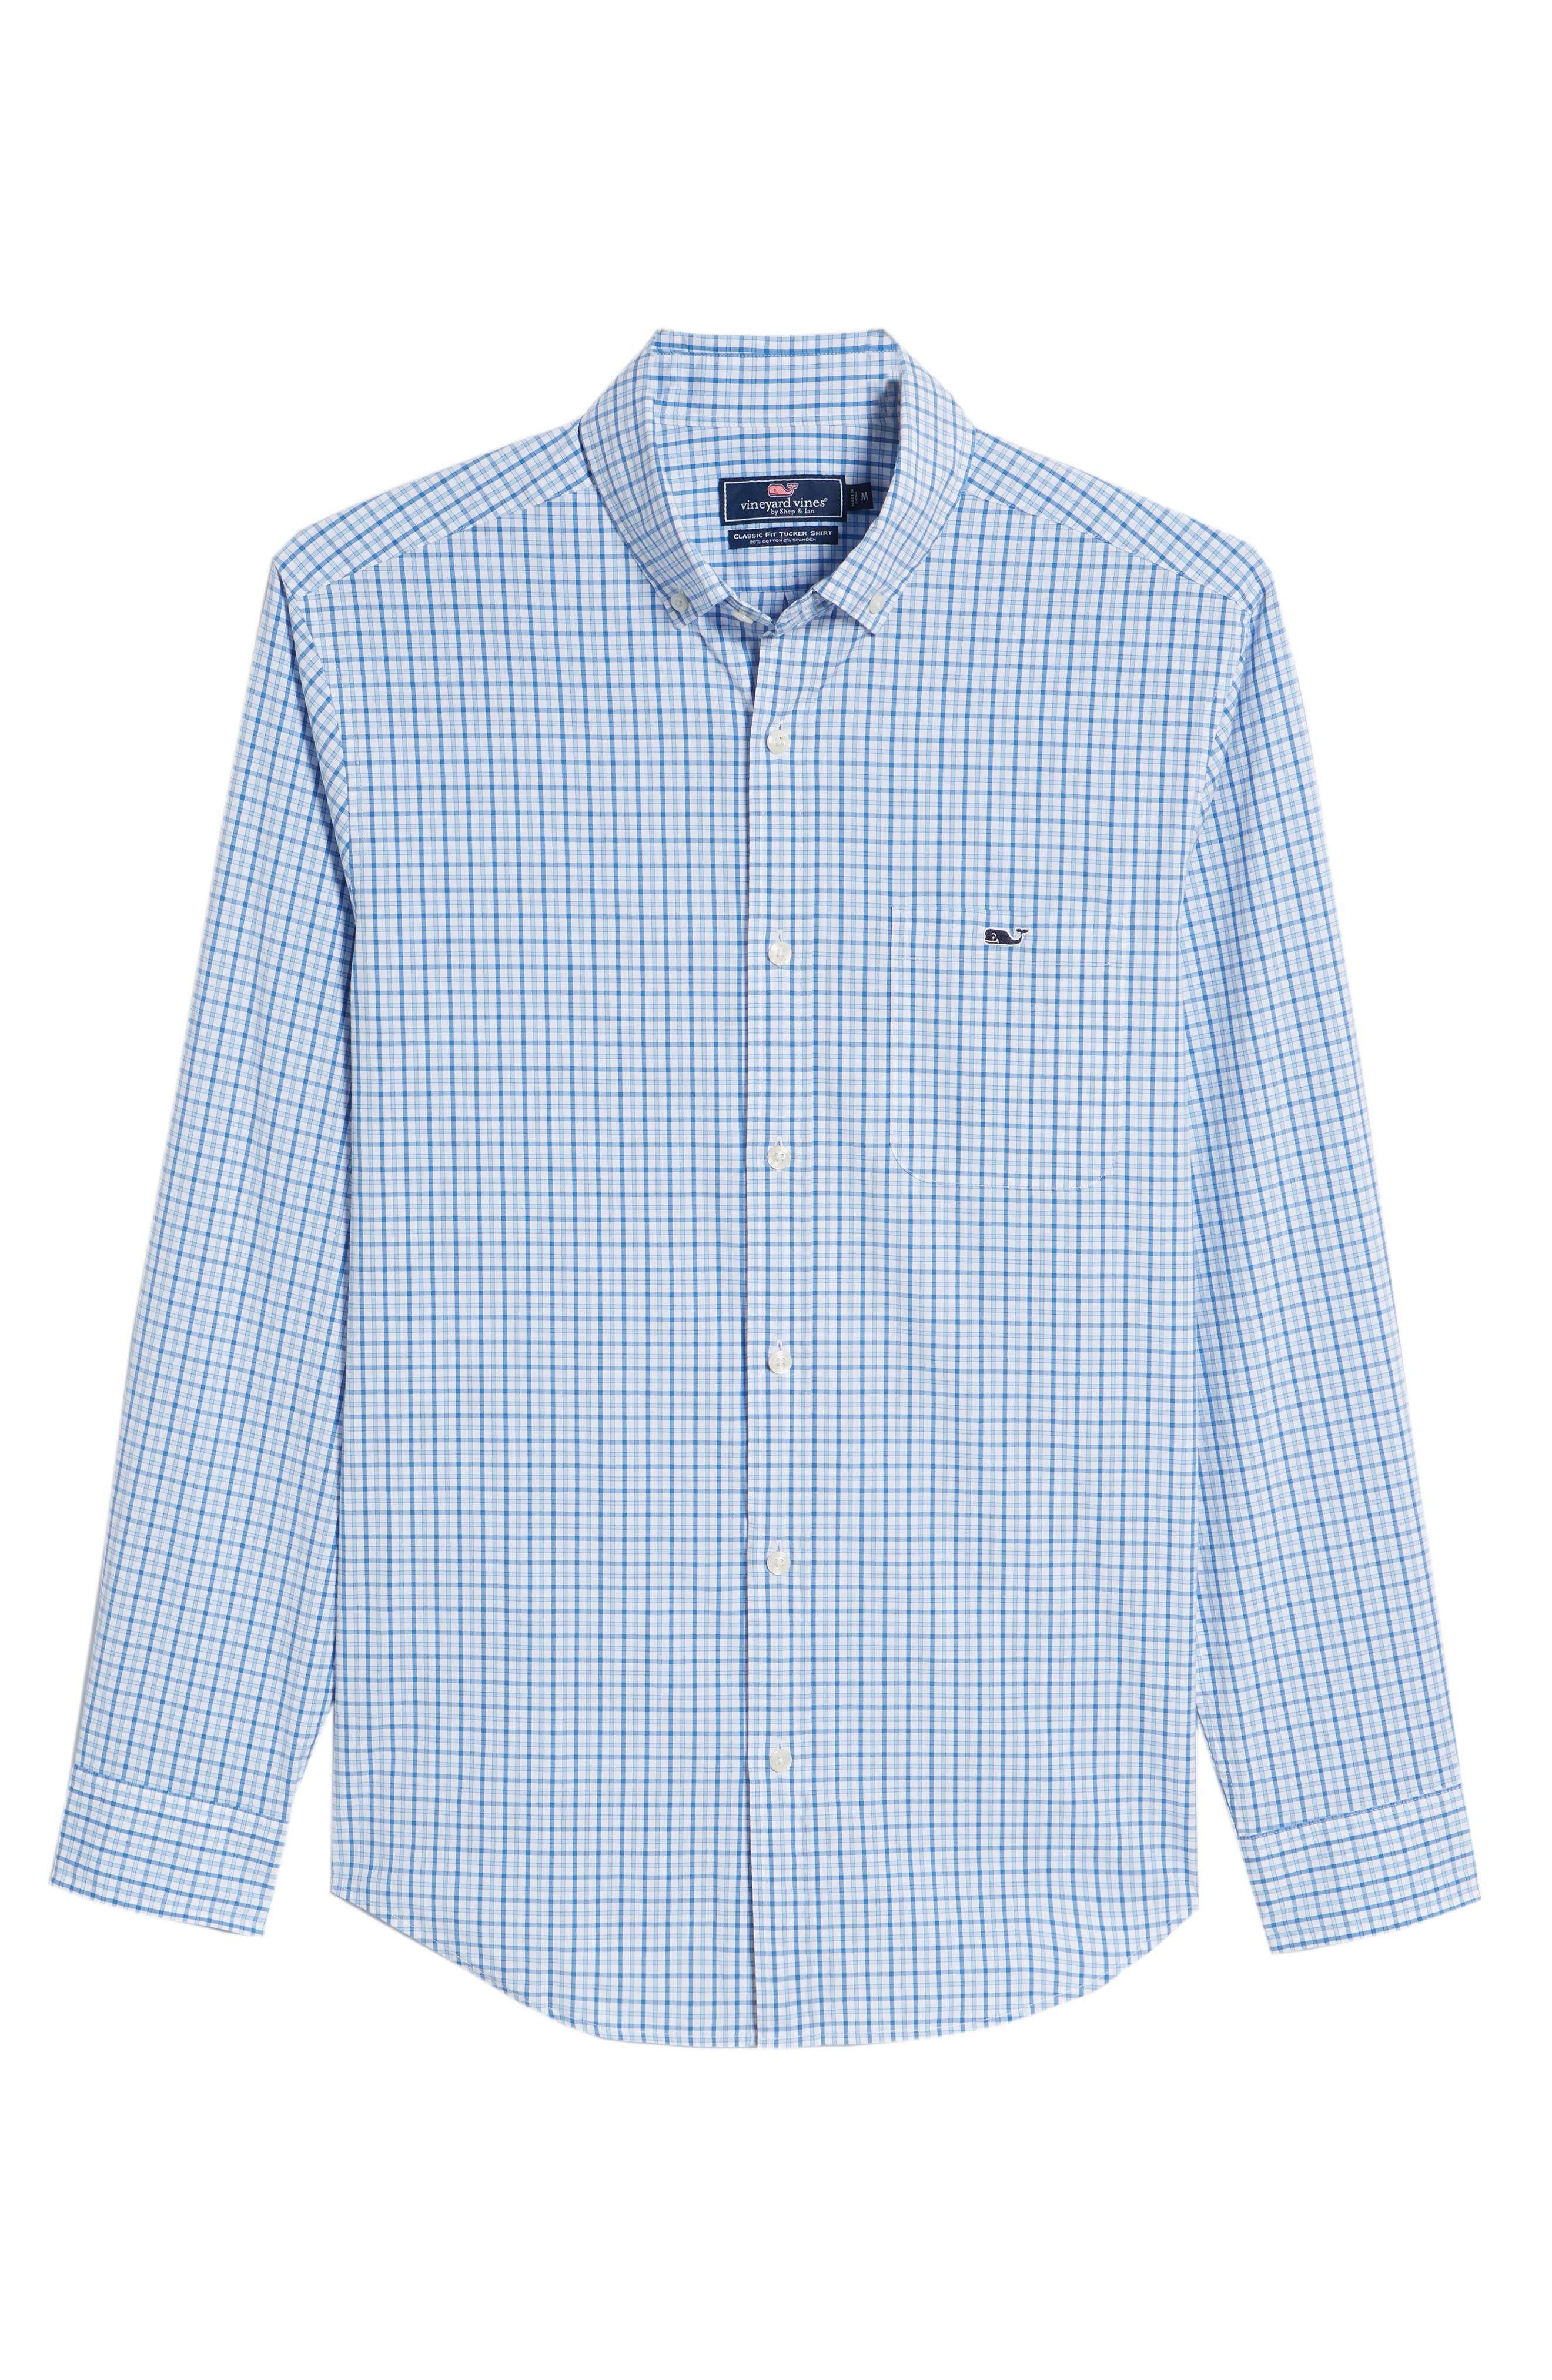 Clark Cove Tucker Classic Fit Check Sport Shirt,                             Alternate thumbnail 6, color,                             Jake Blue